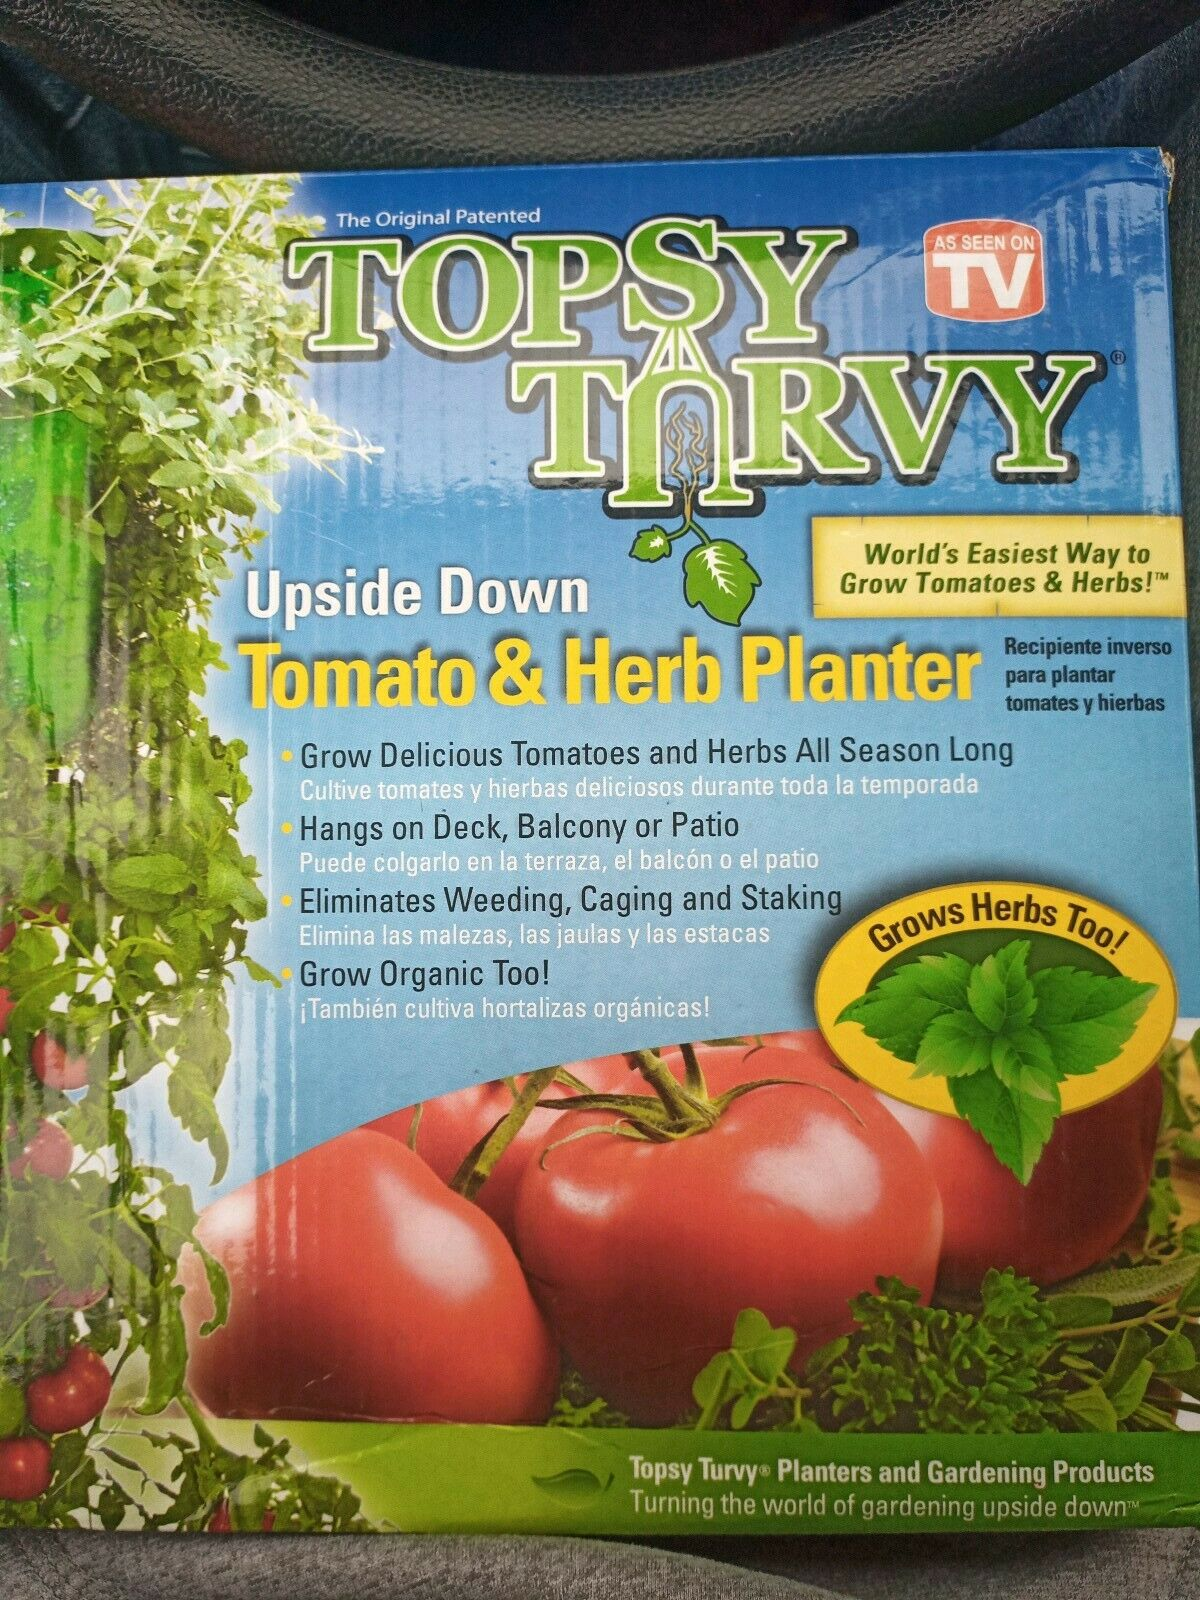 Planter Des Tomates En Pot topsy turvy tomato and herb planter